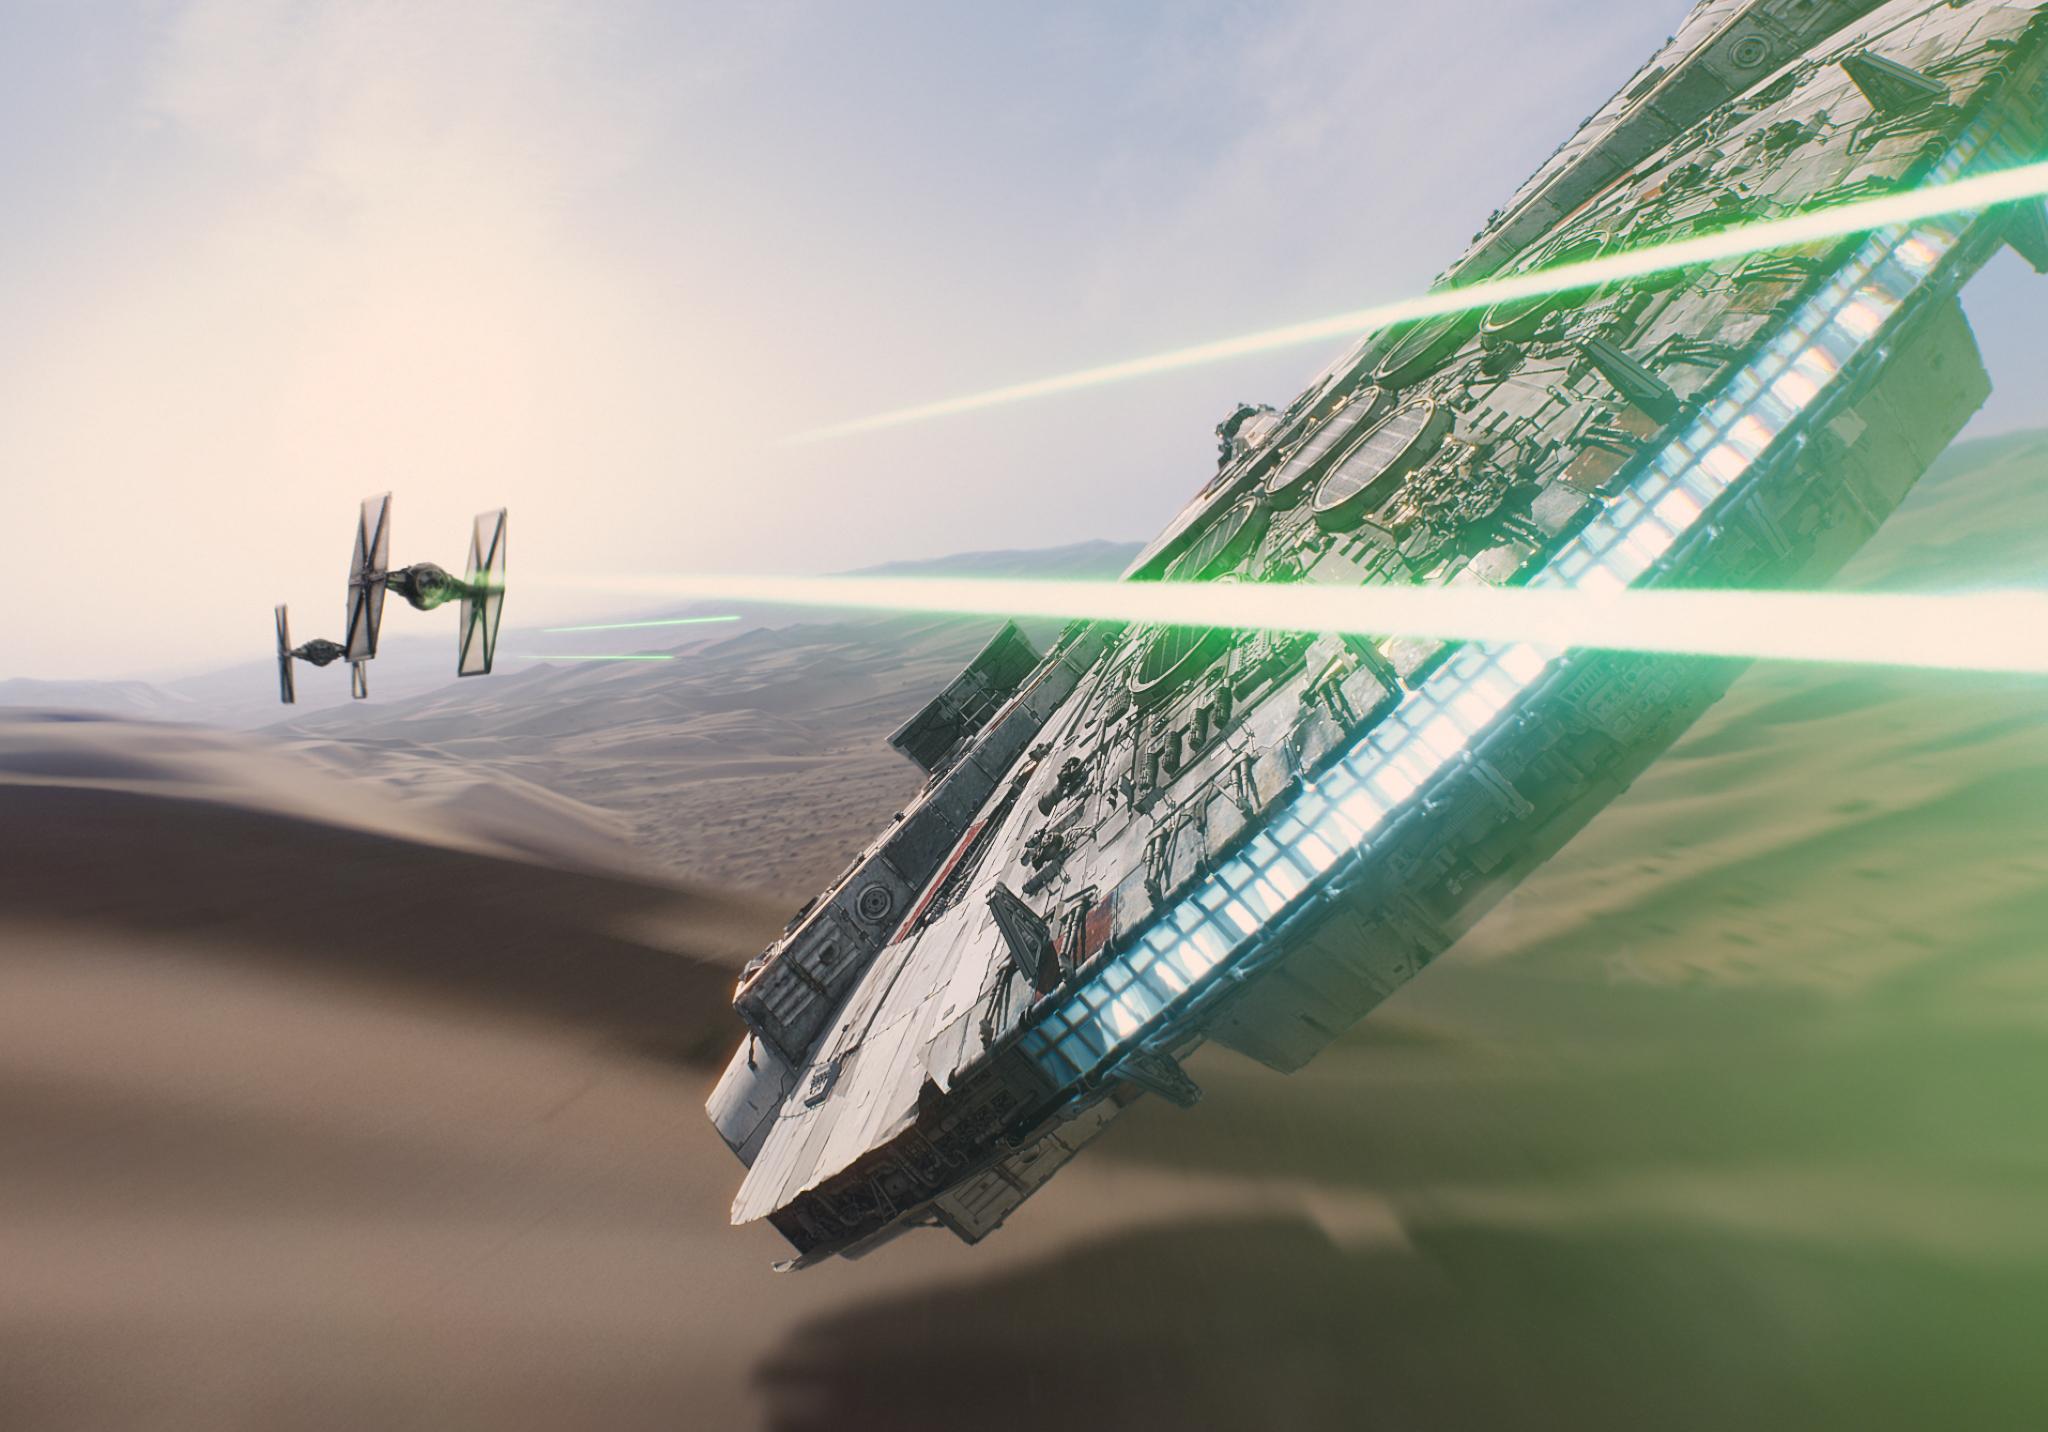 (Picture: Disney/Lucasfilm via AP)